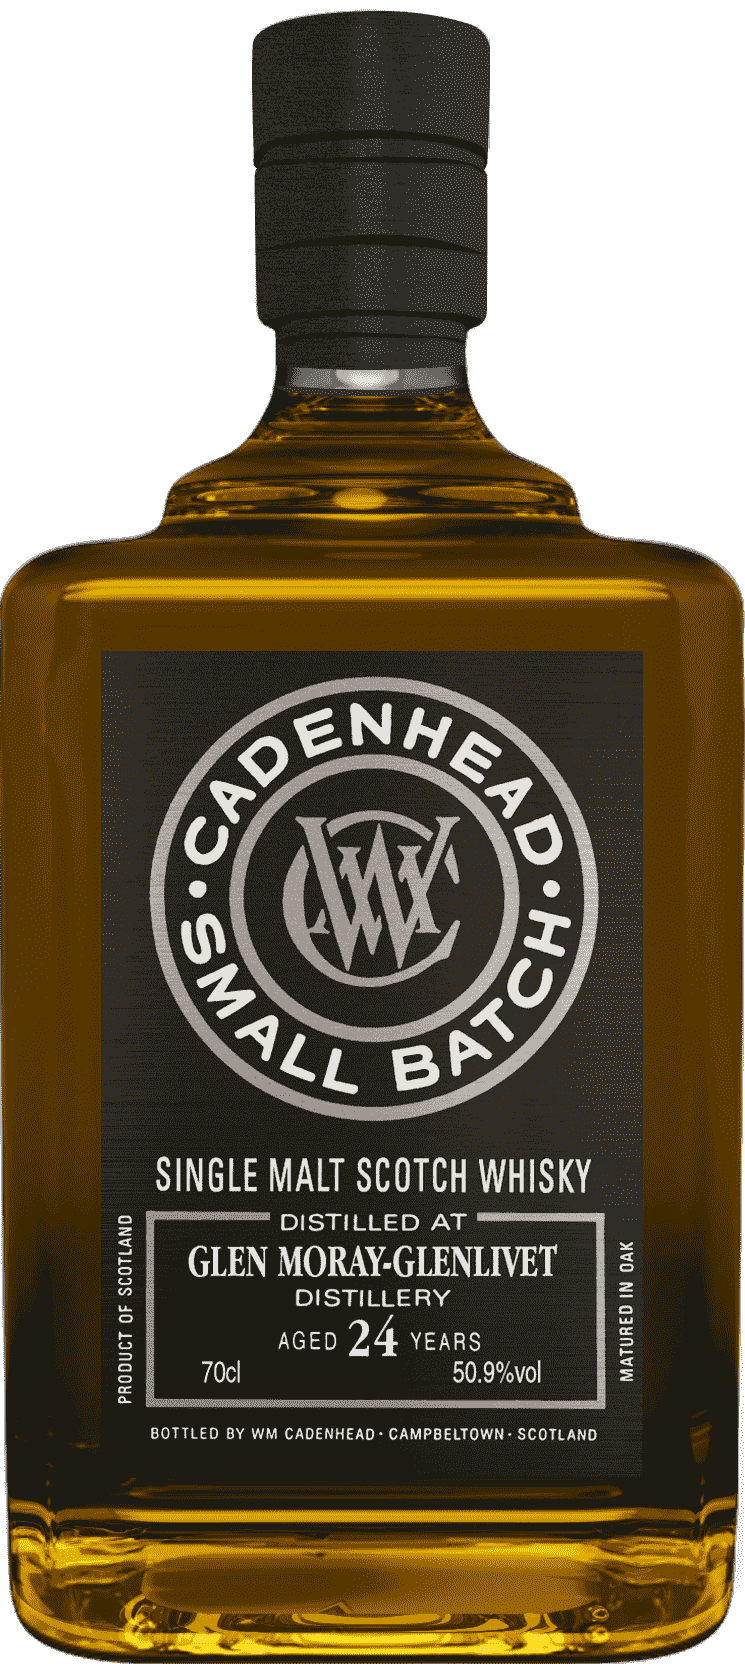 A Bottle of Glen-Moray-Glenlivet